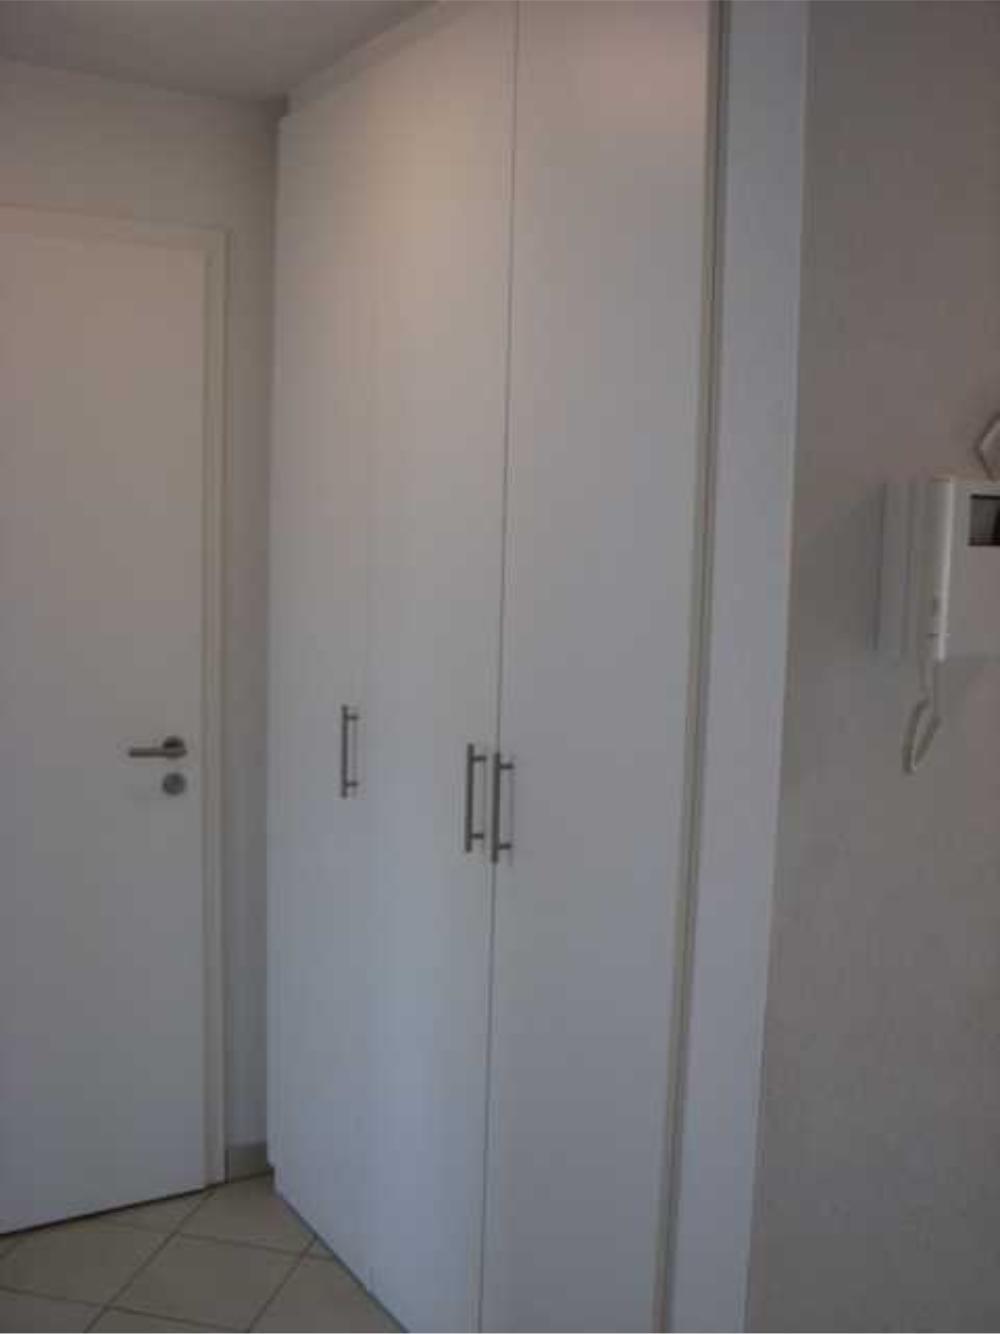 gesch ftsr ume m nchen f rstenried boutique b ro. Black Bedroom Furniture Sets. Home Design Ideas